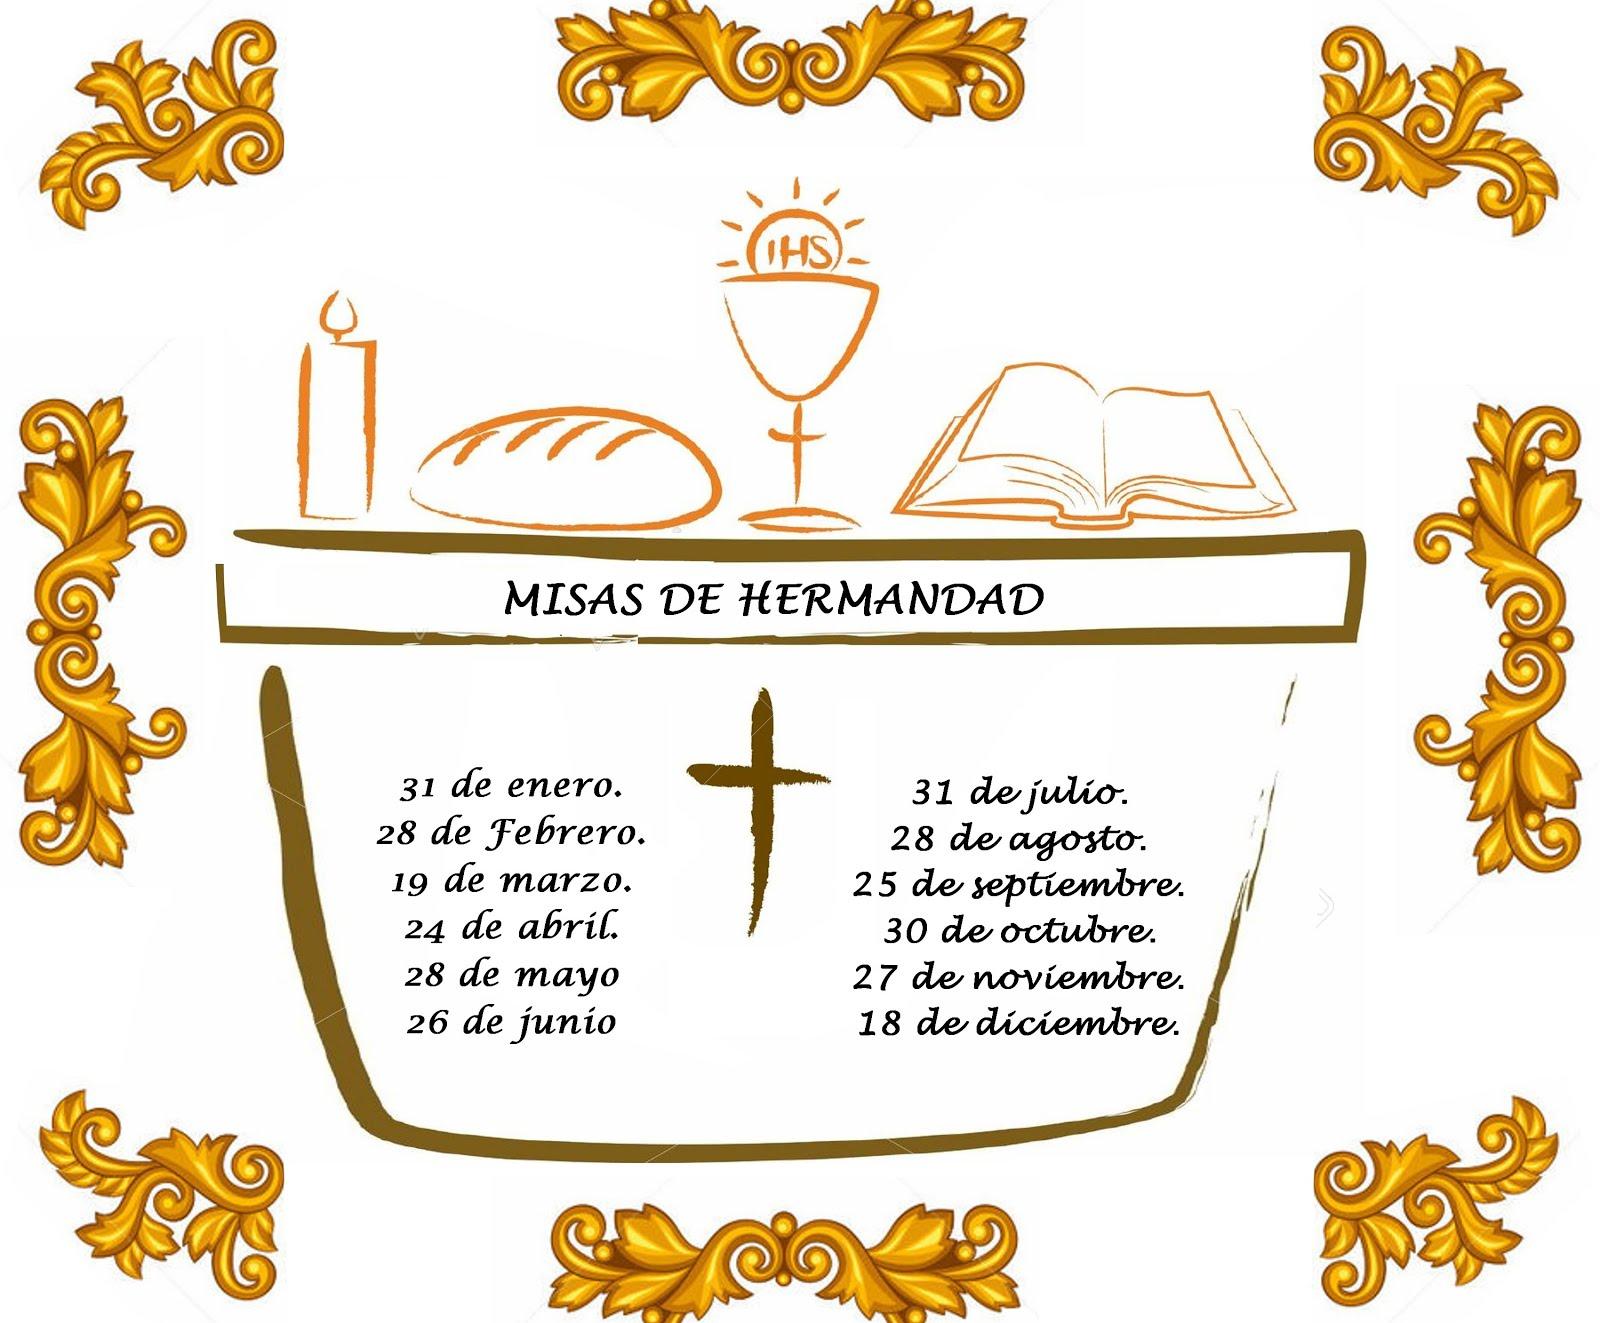 MISAS DE HERMANDAD